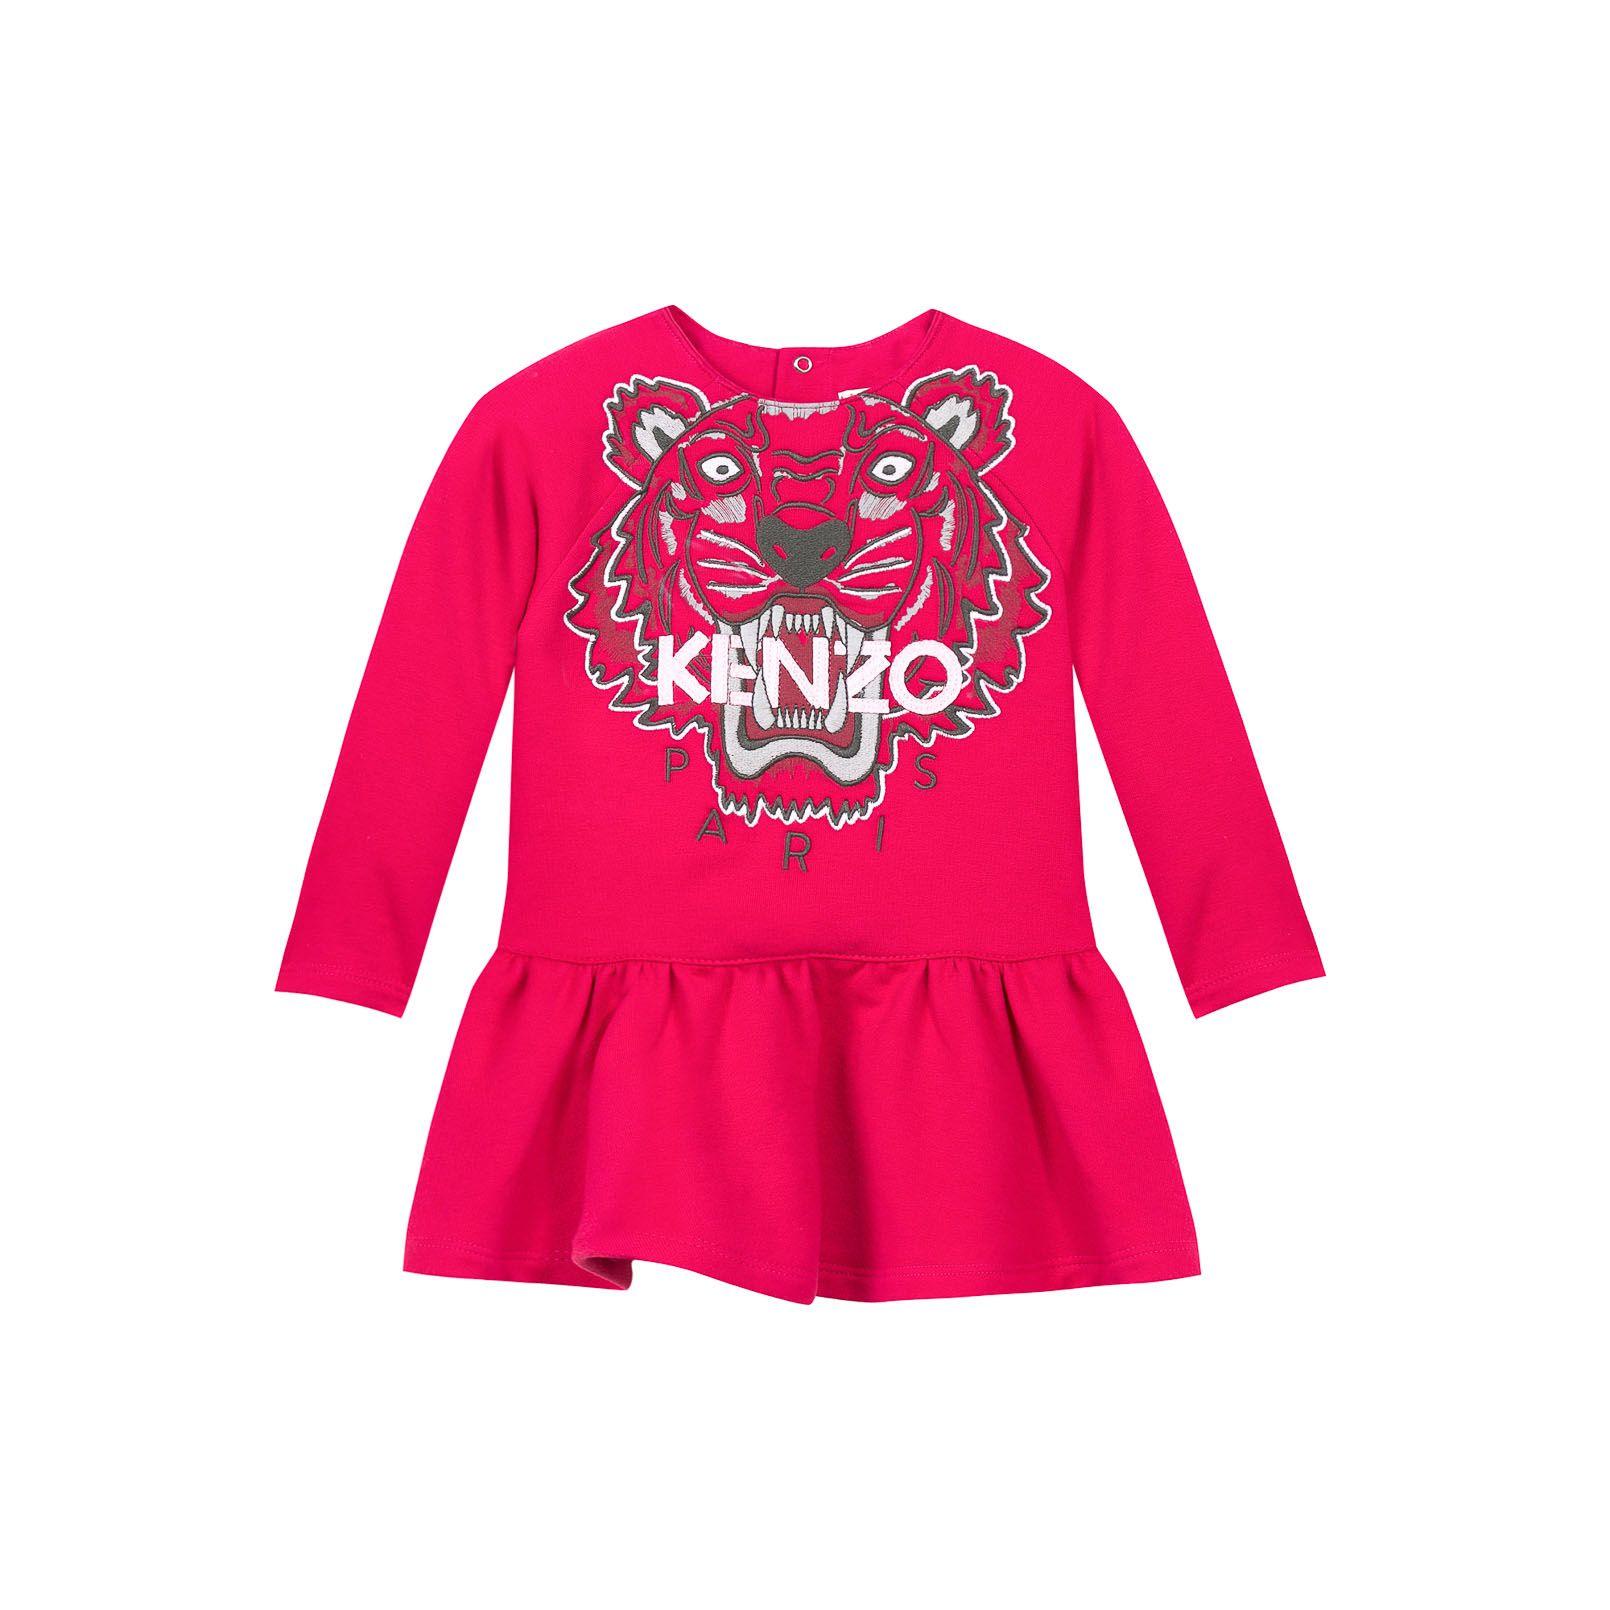 6dfd770cbee3 Kenzo Babykleid Kids Robe Molleton Robe  Babymode  Bekleidung  Baby  Kleid   Kenzo